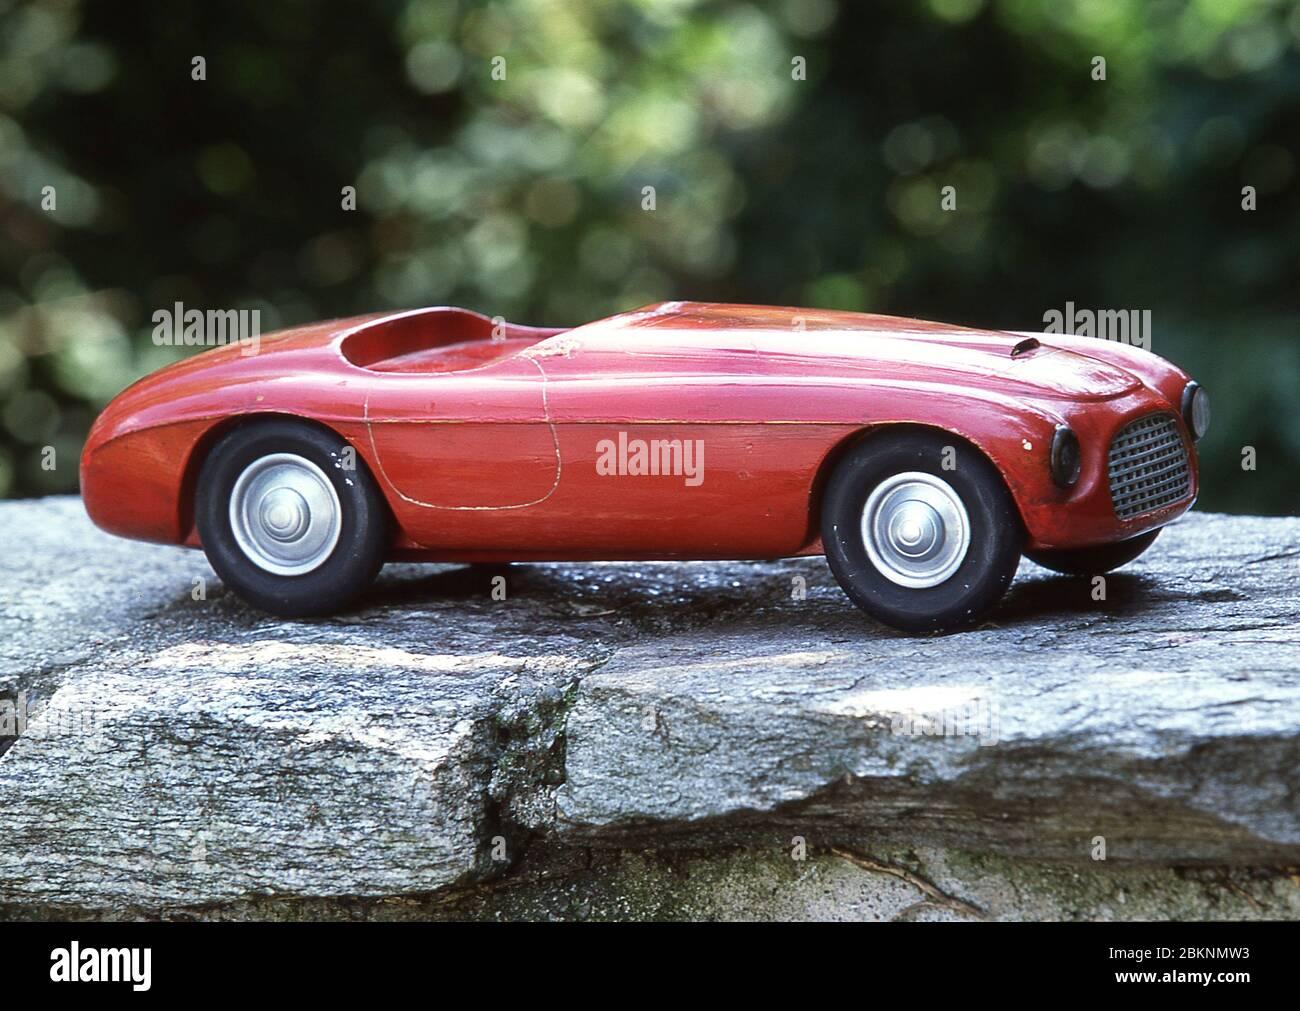 Ferrari Prototype Stockfotos Und Bilder Kaufen Alamy